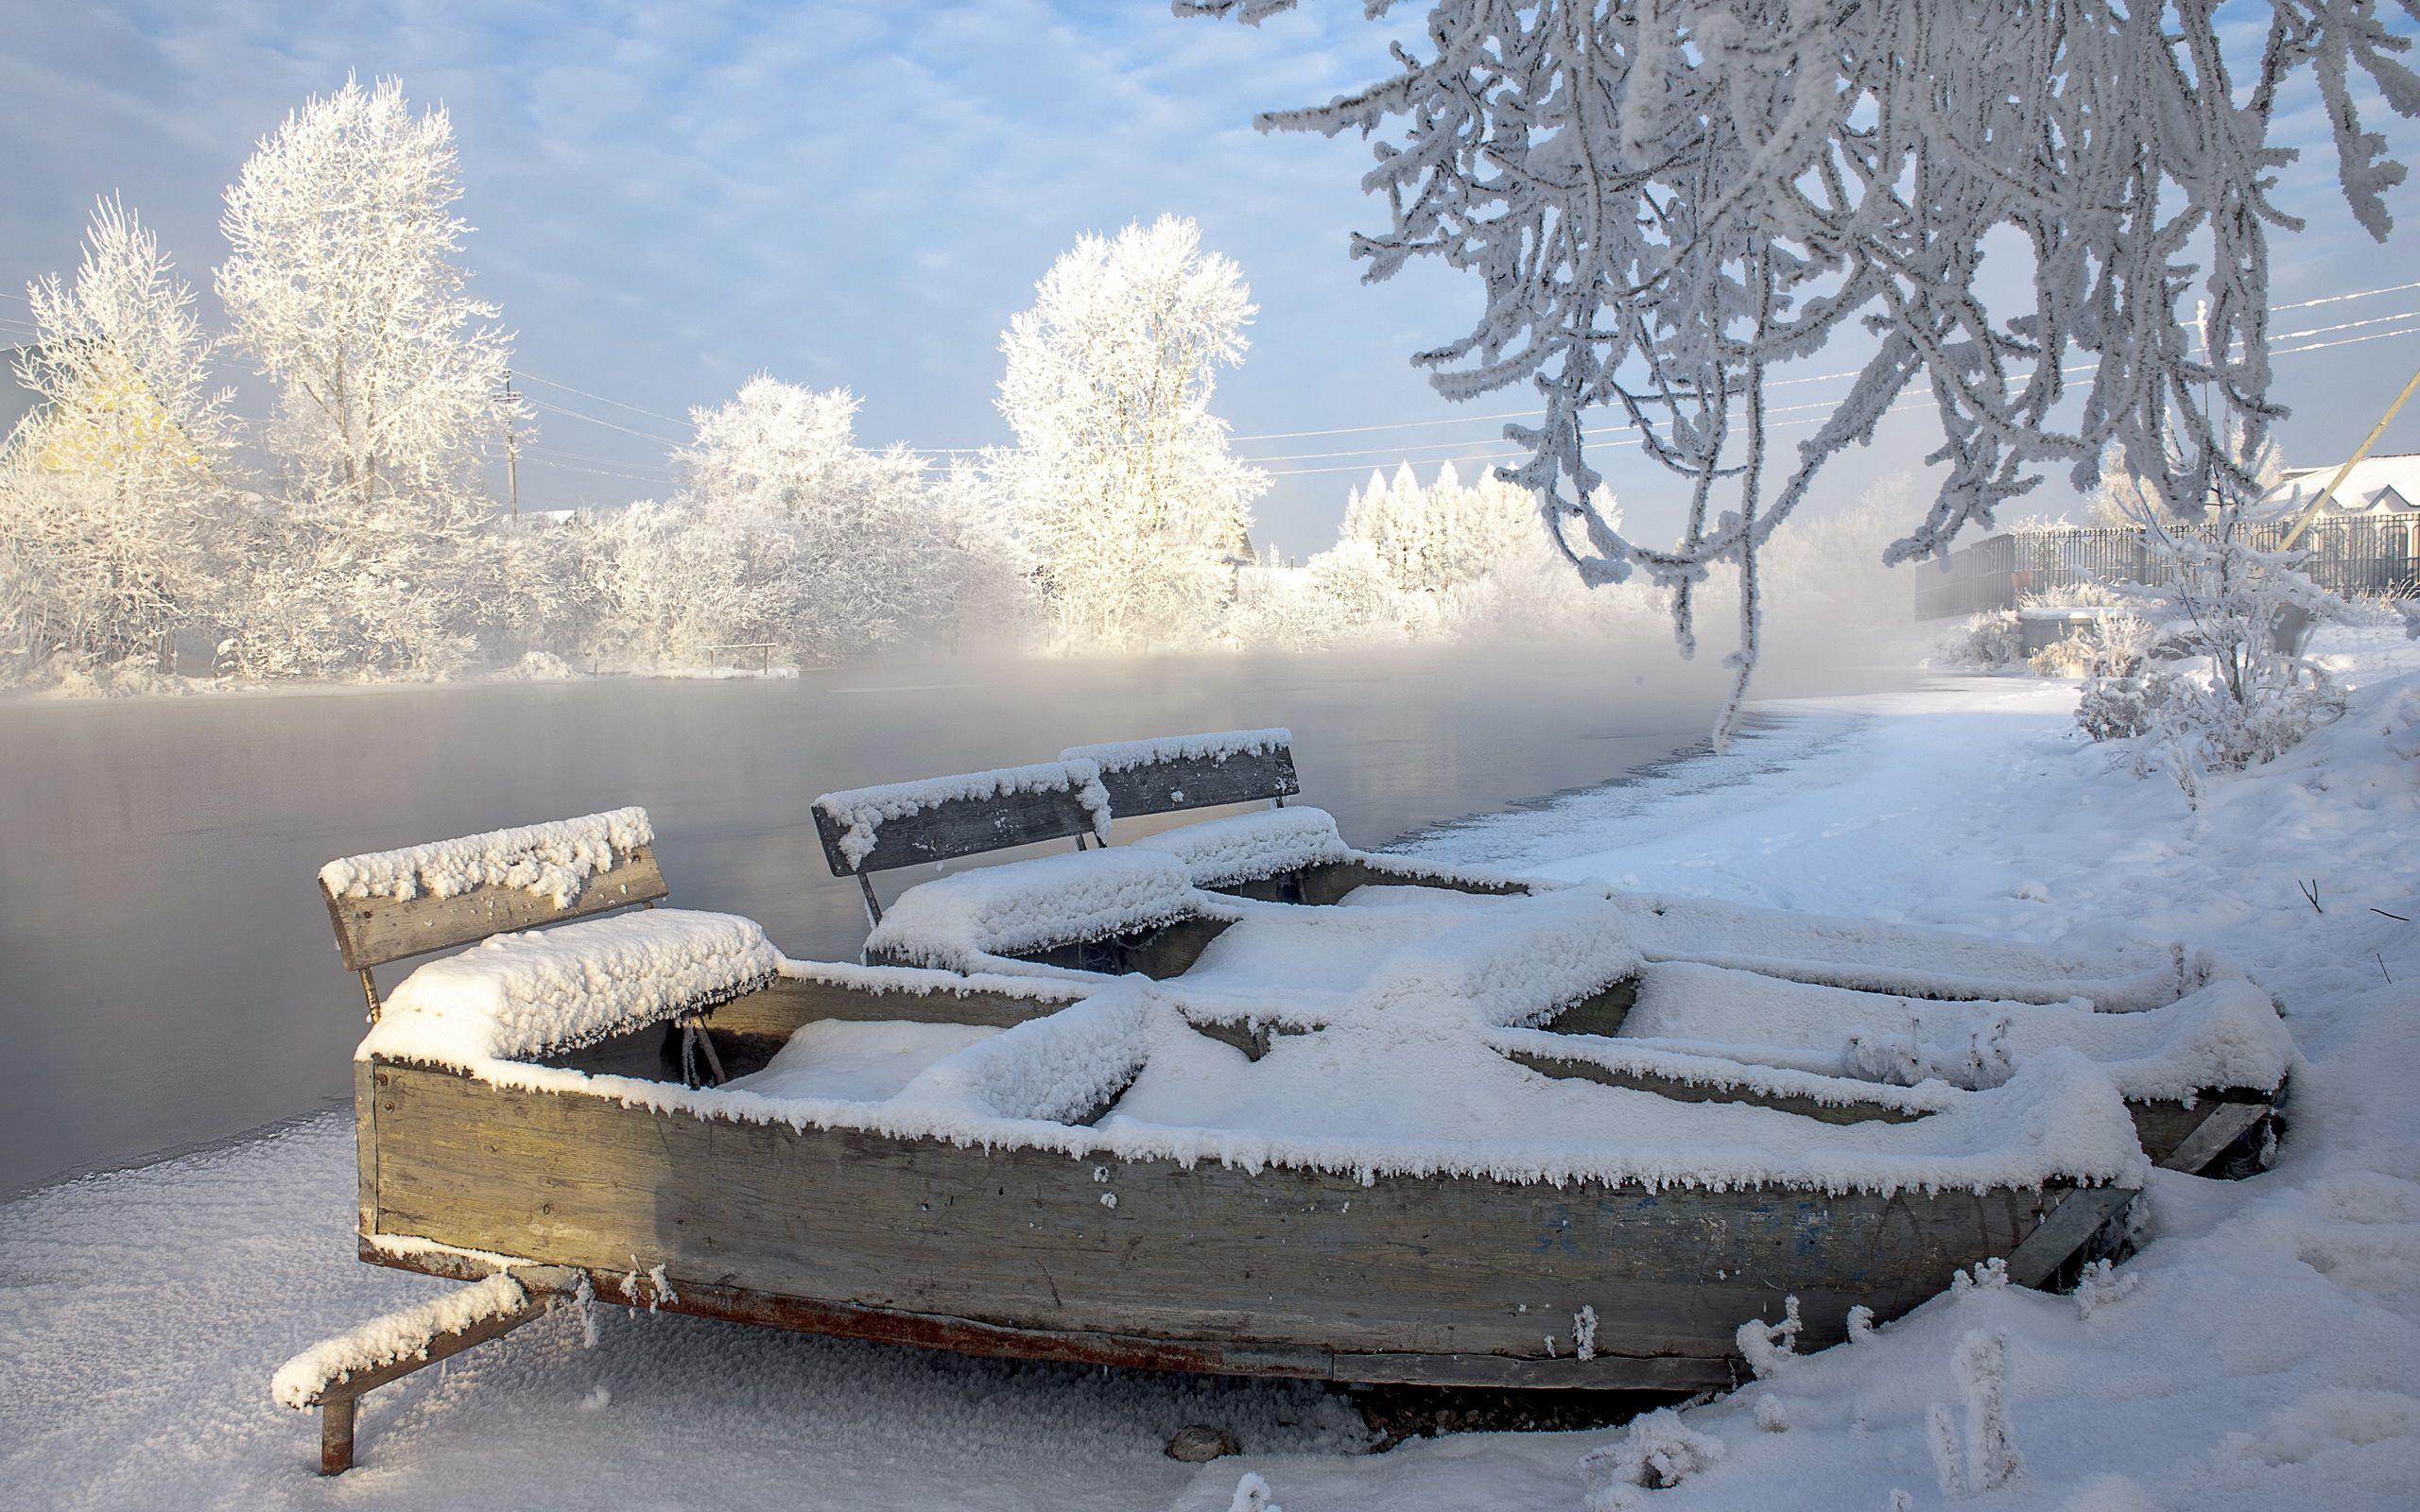 136248 Заставки и Обои Лодки на телефон. Скачать Природа, Река, Лодки, Зима, Пейзаж картинки бесплатно